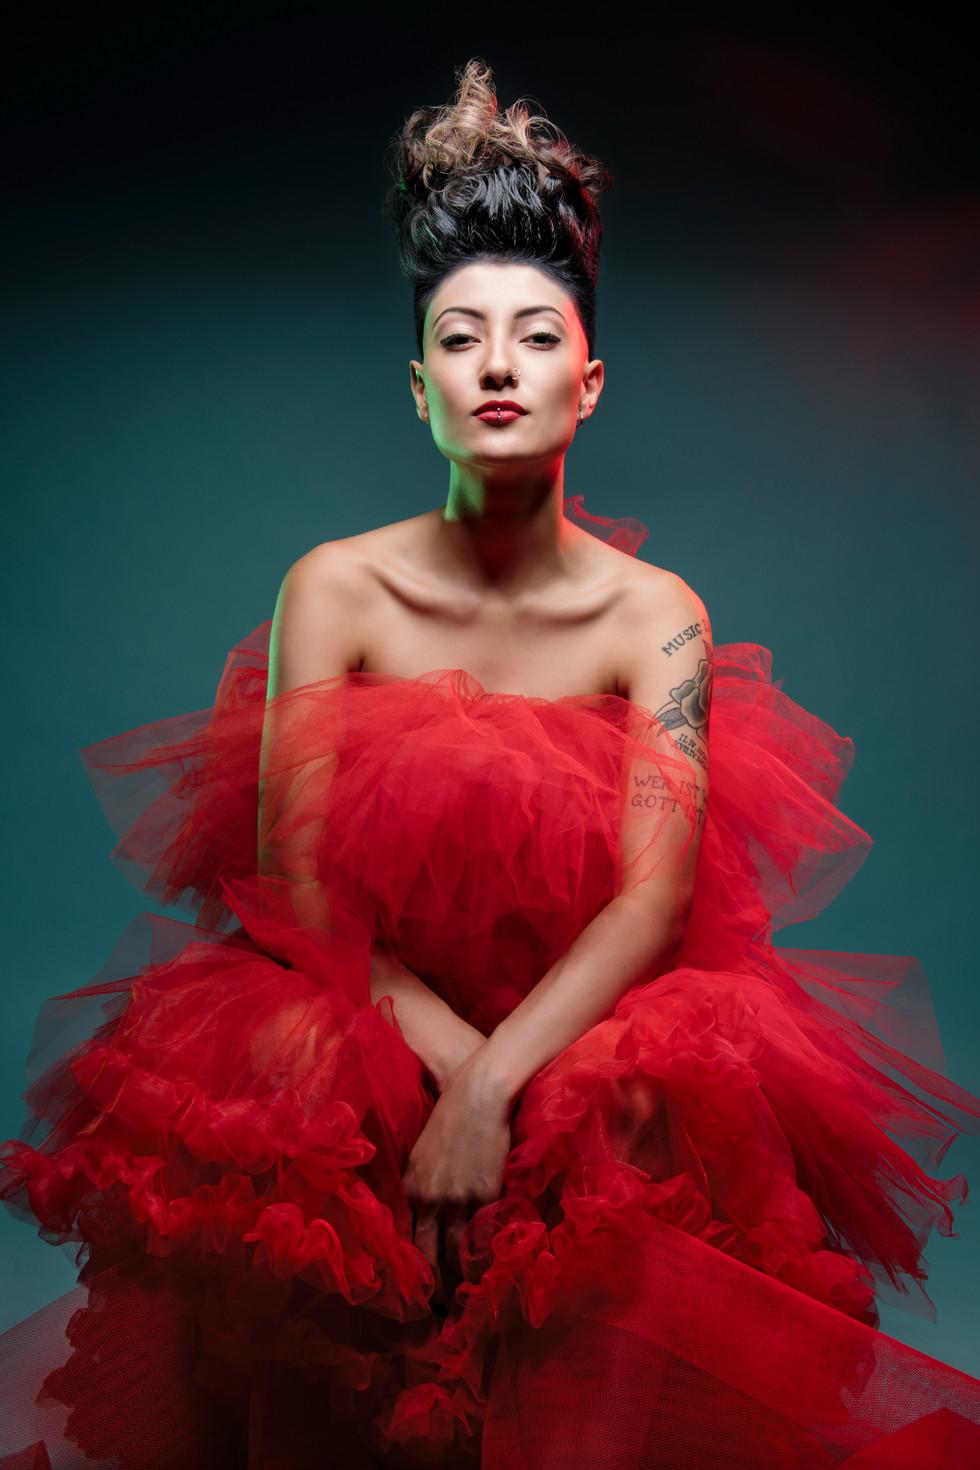 Mitch, Hair & Beauty, J7, creative look, color, vlado golub photography, Vlado Golub Fotografie